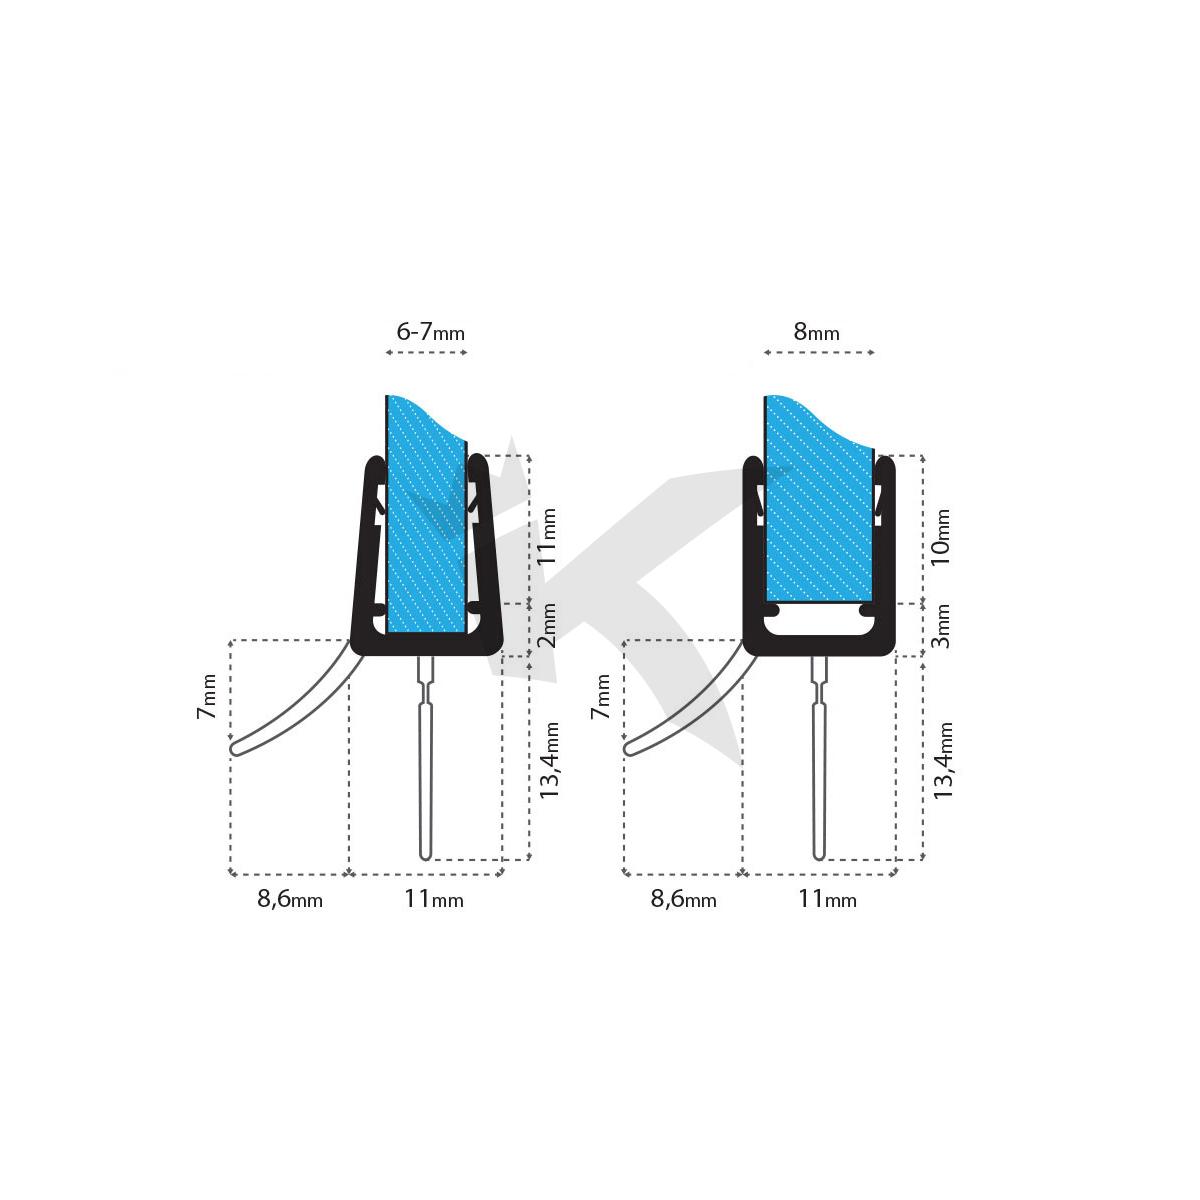 Duschdichtung-3-5-8mm-Duschprofil-Wasserabweiser-Ersatzdichtung ...